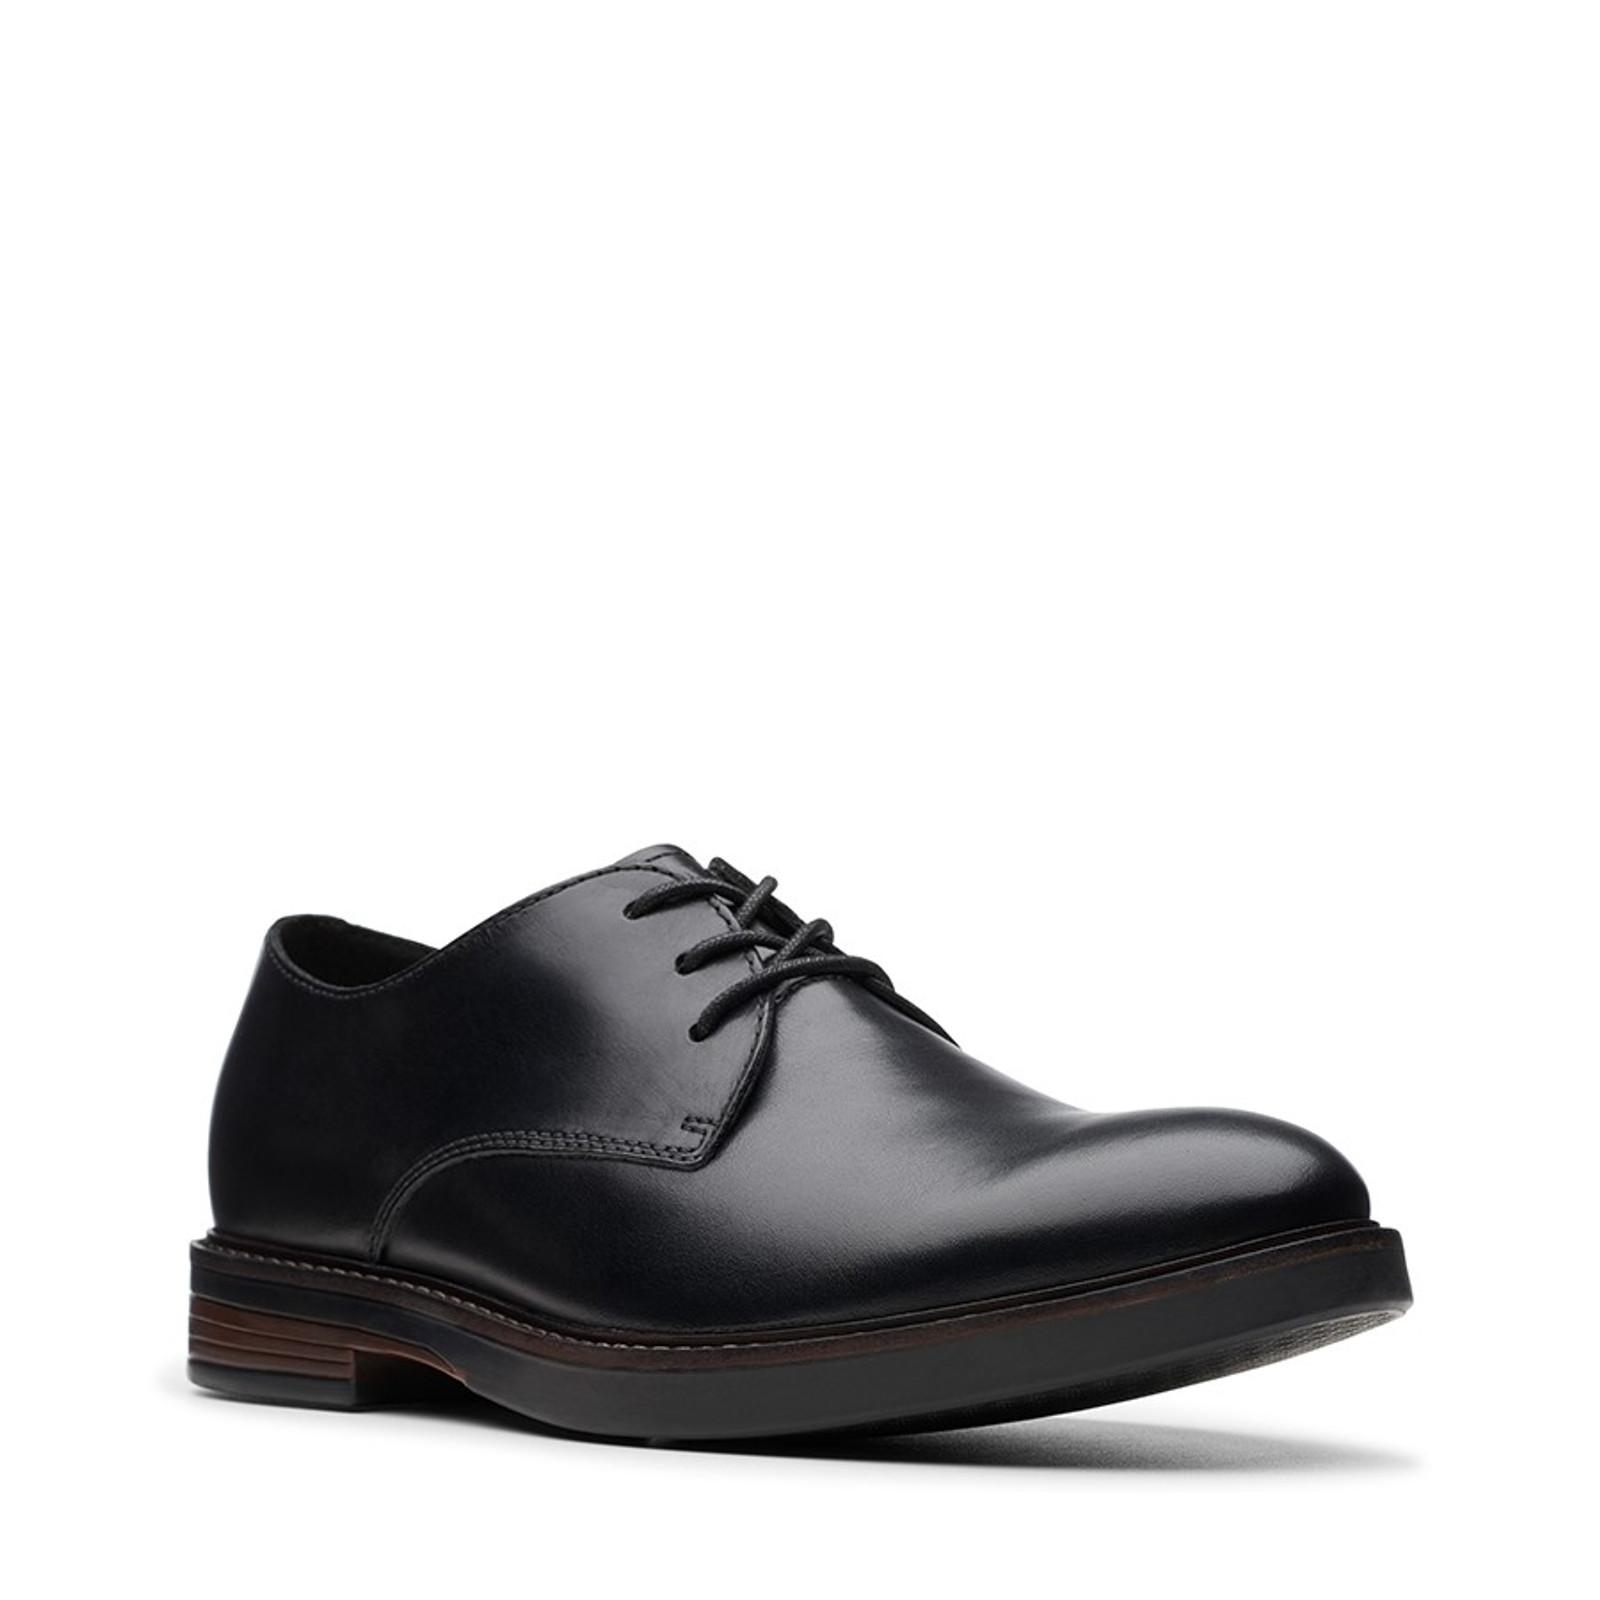 Clarks Mens PAULSON PLAIN Black Leather